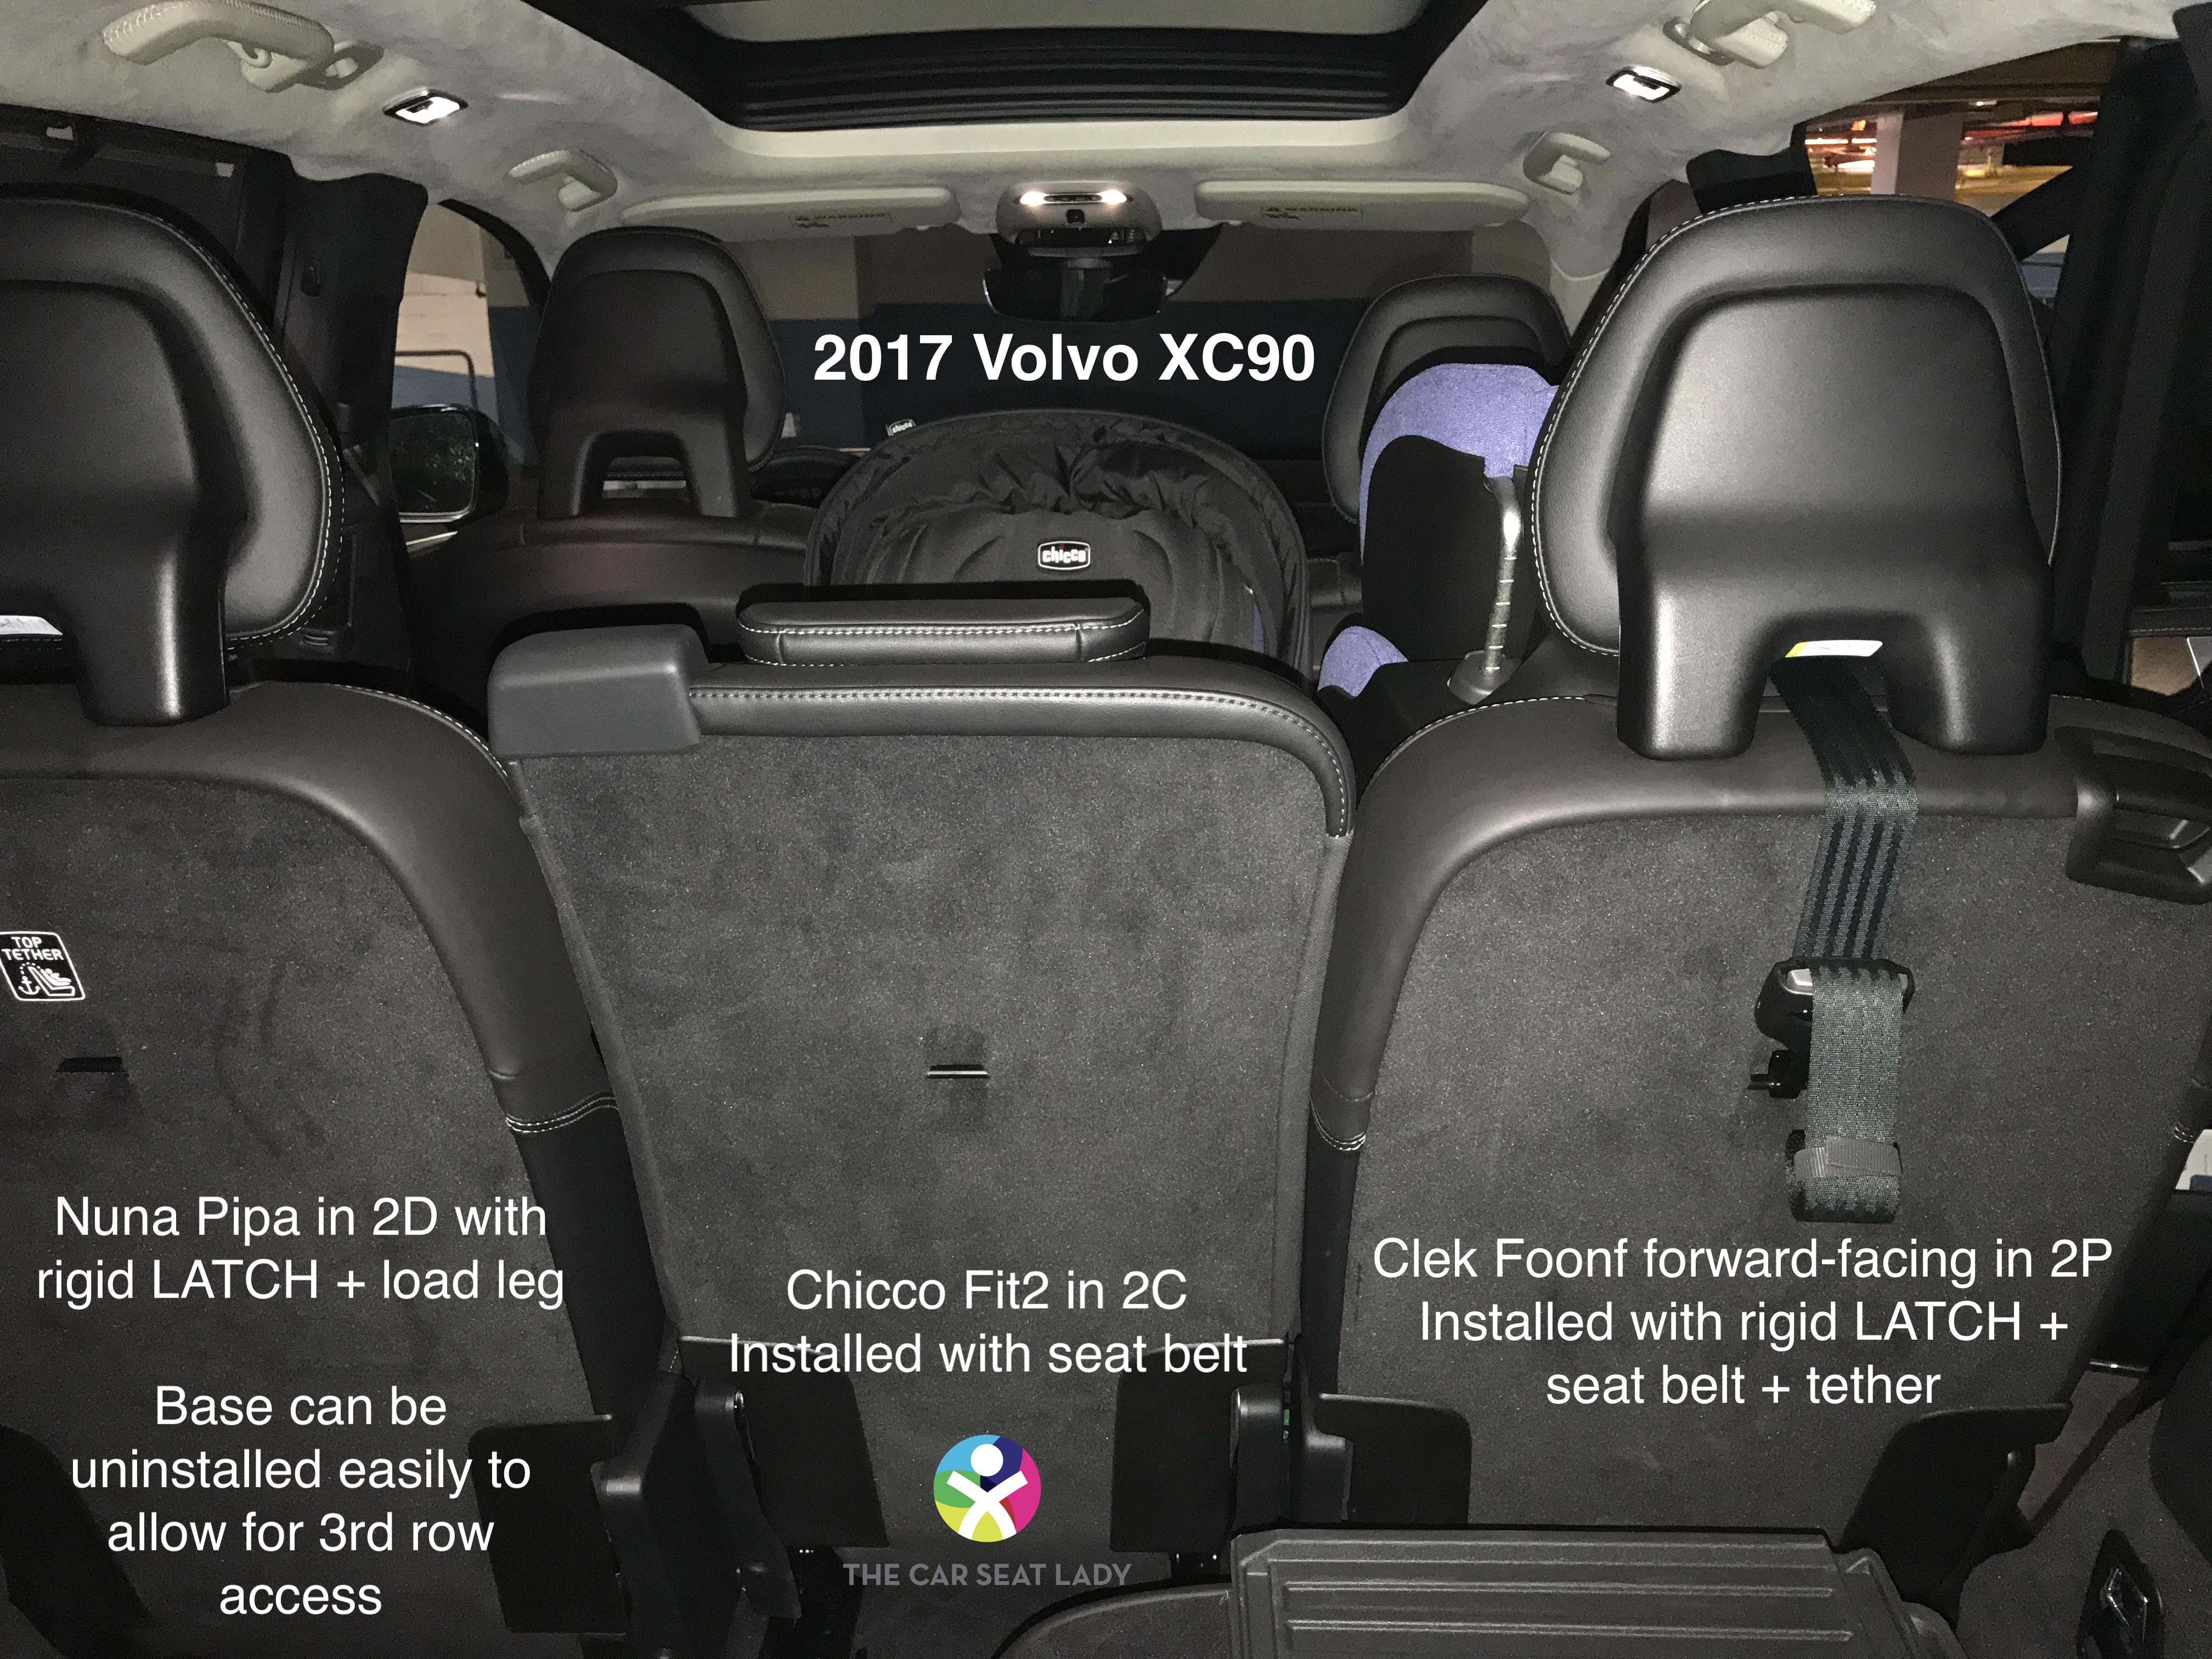 The Car Seat Lady Volvo Xc90